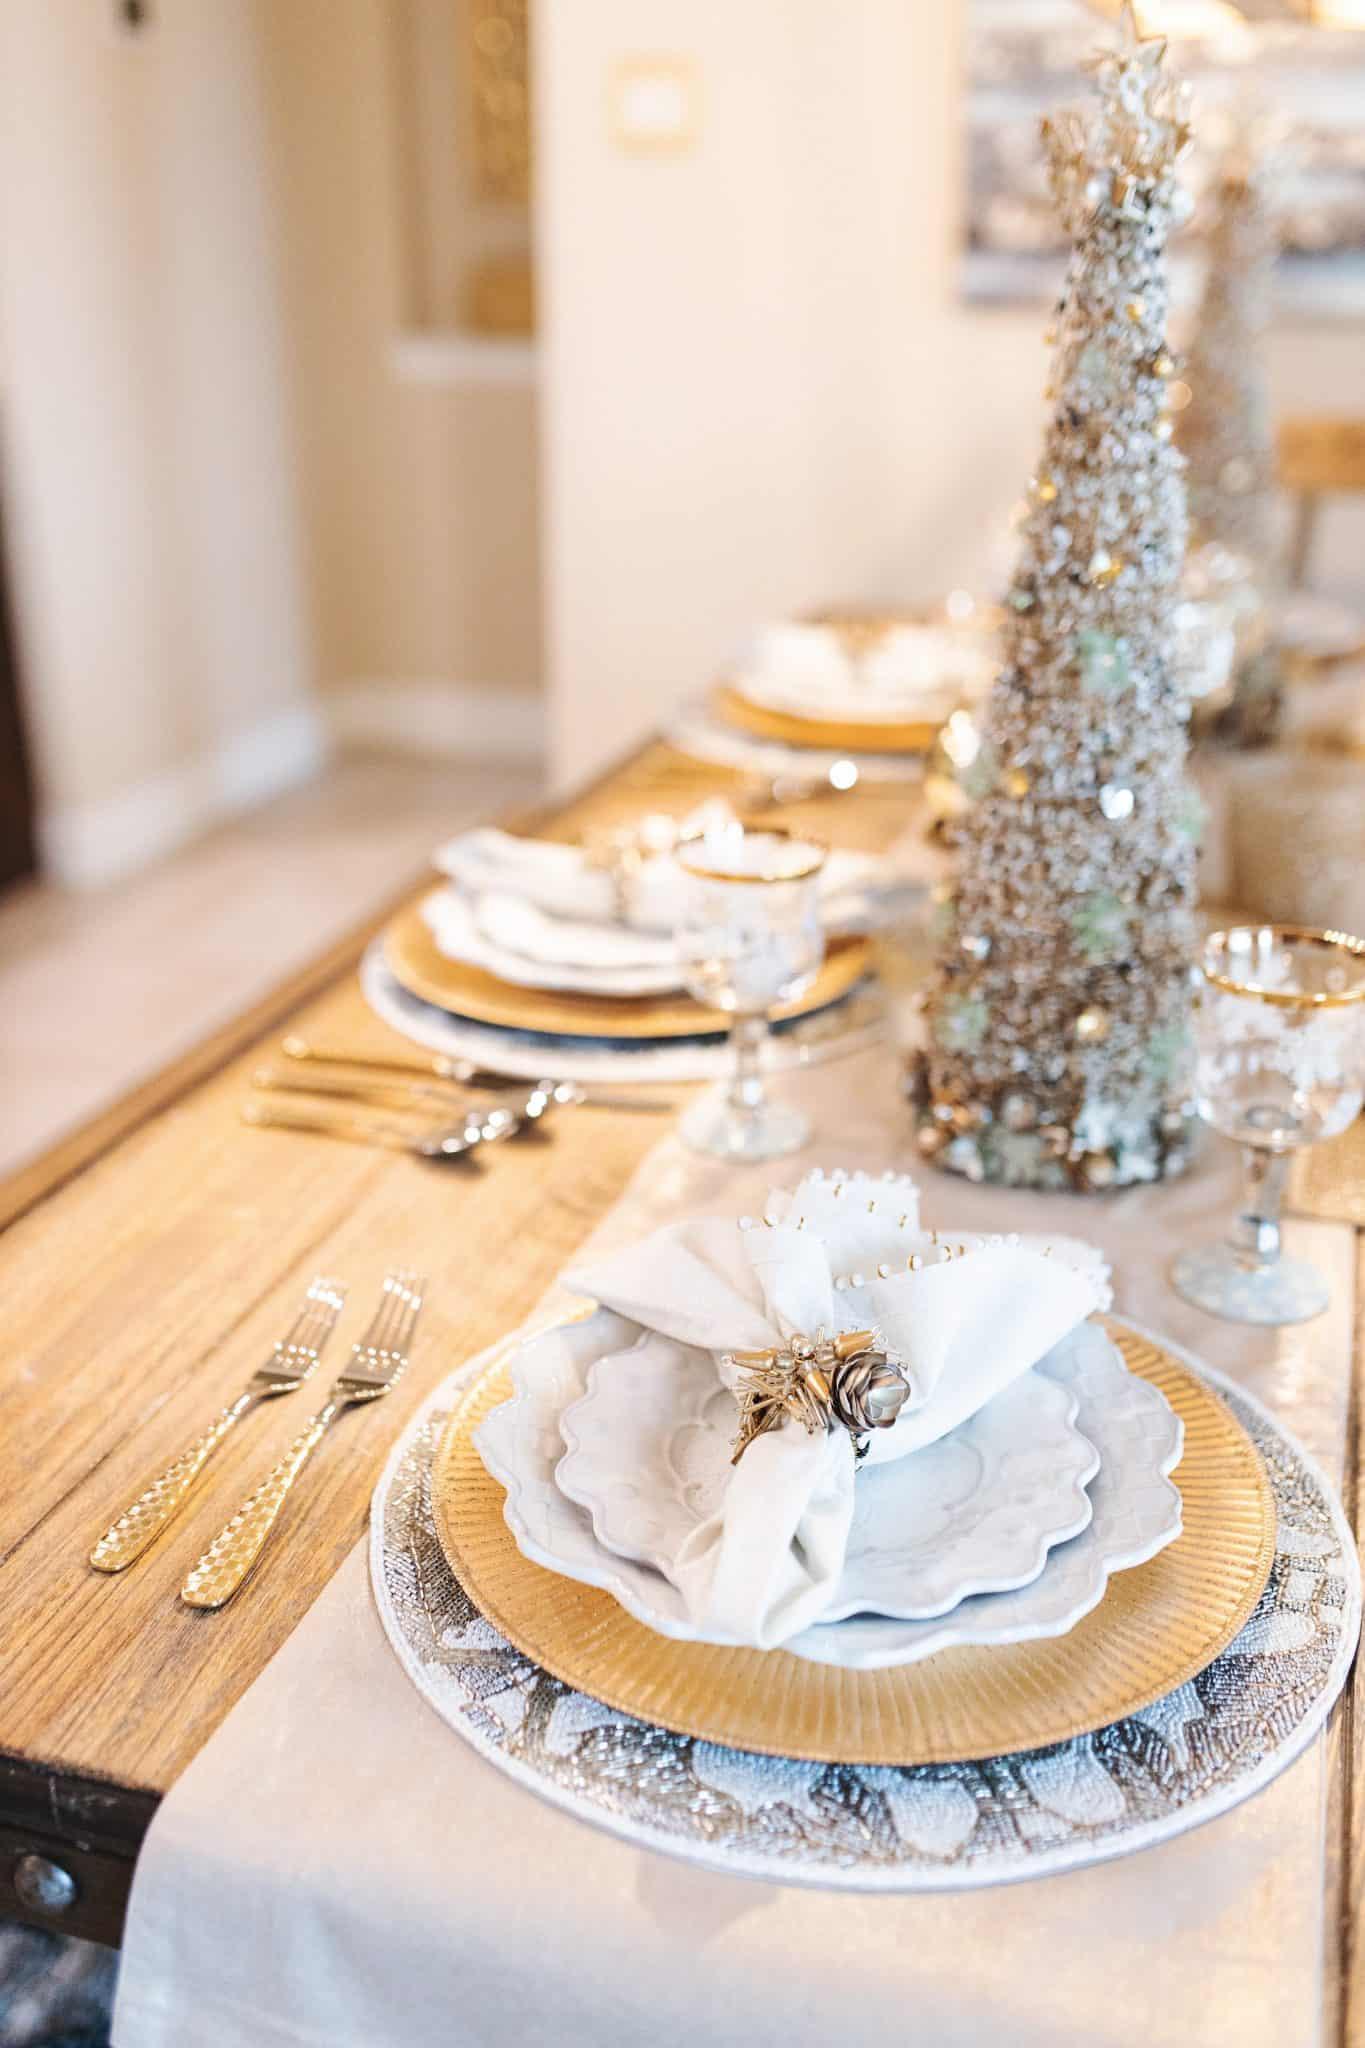 Mackenzie Childs Table Setting Life And Style Glamorous Versatility